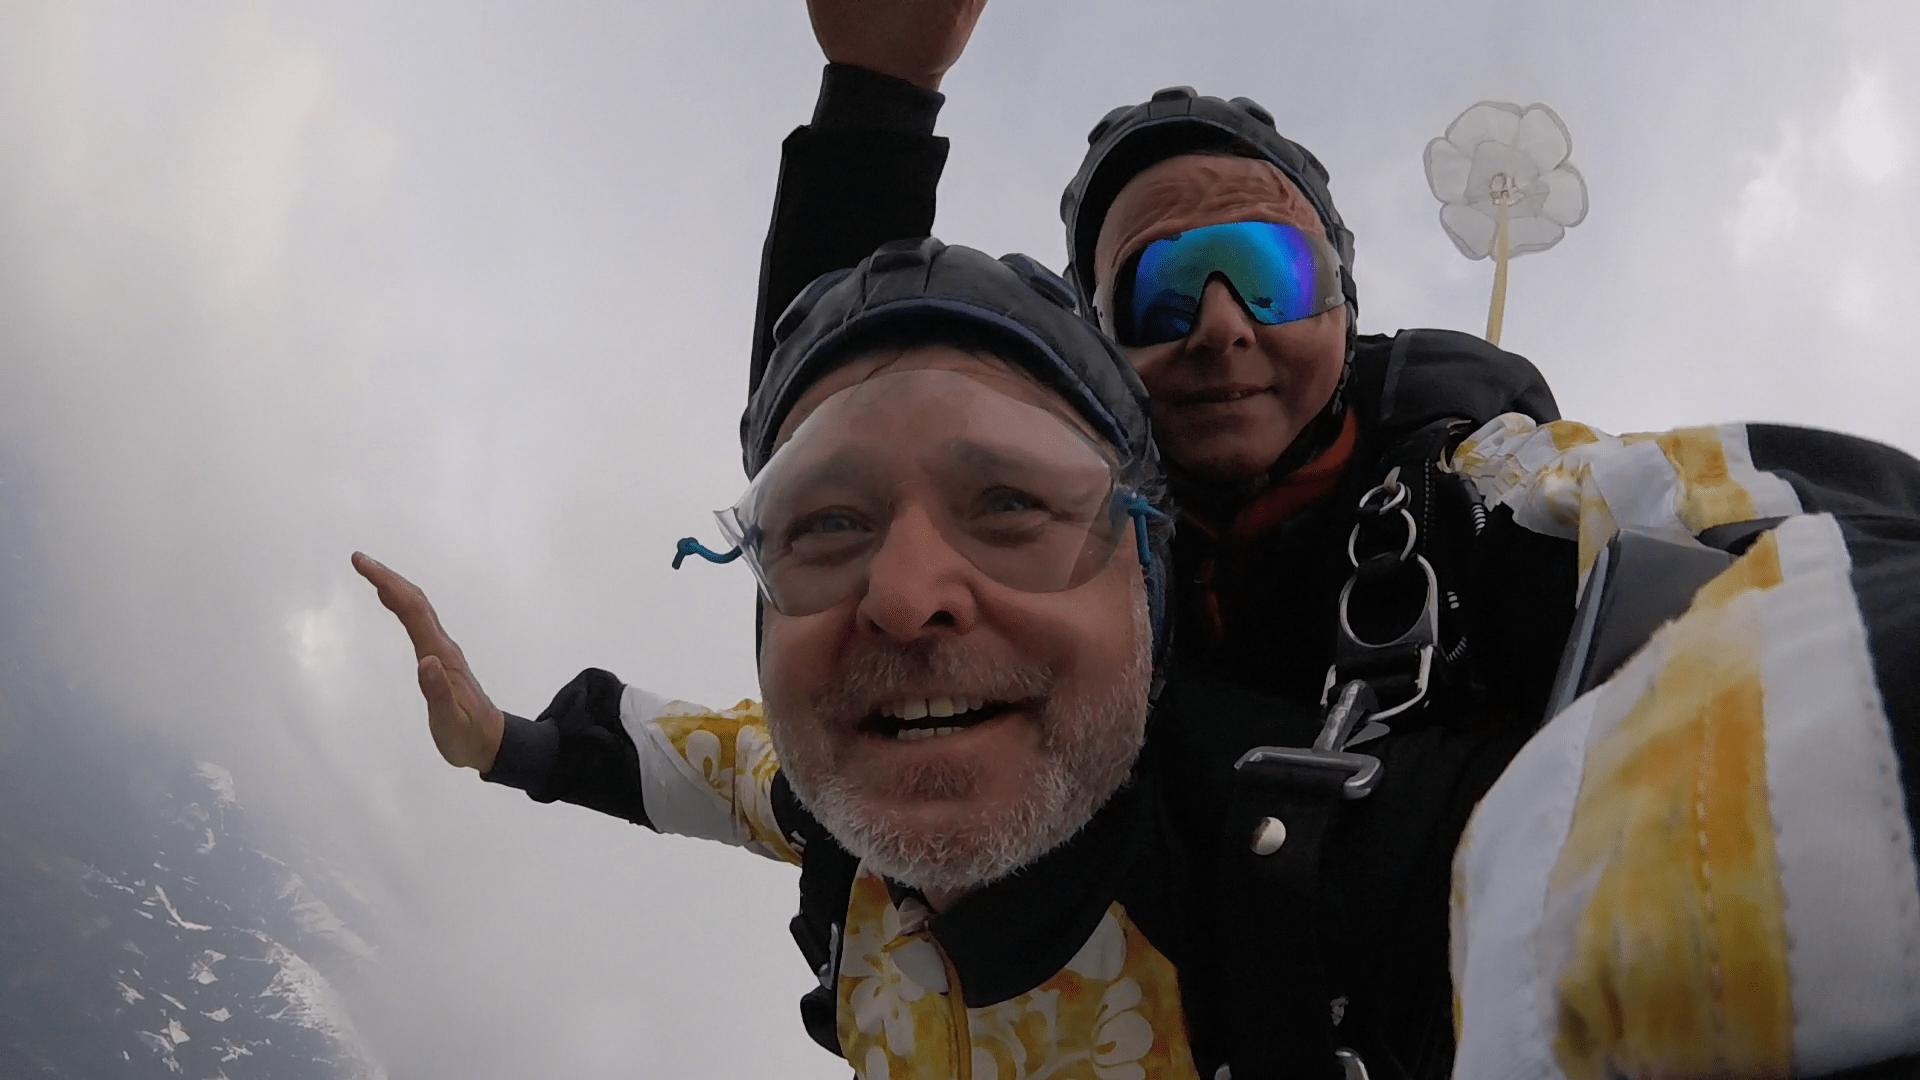 Fallschirm Tandemsprung Trieben Steiermark 294